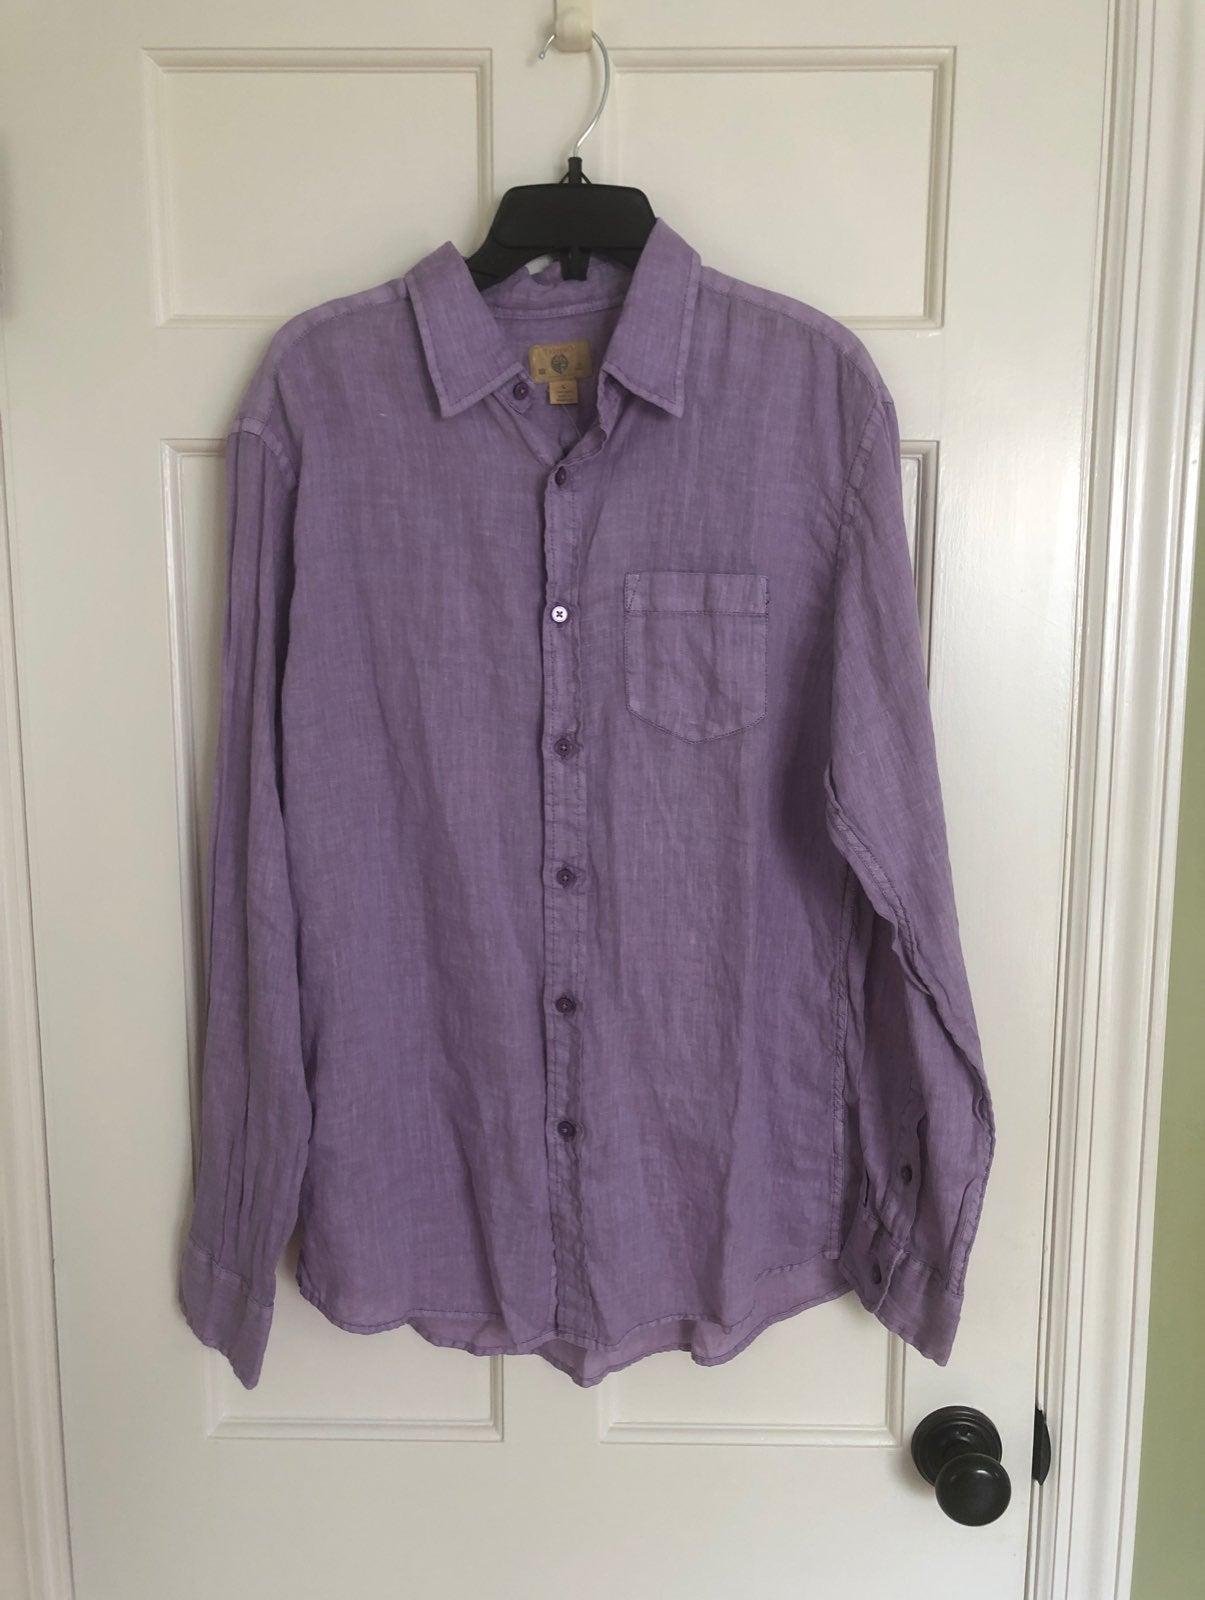 long sleeve shirts for men, L